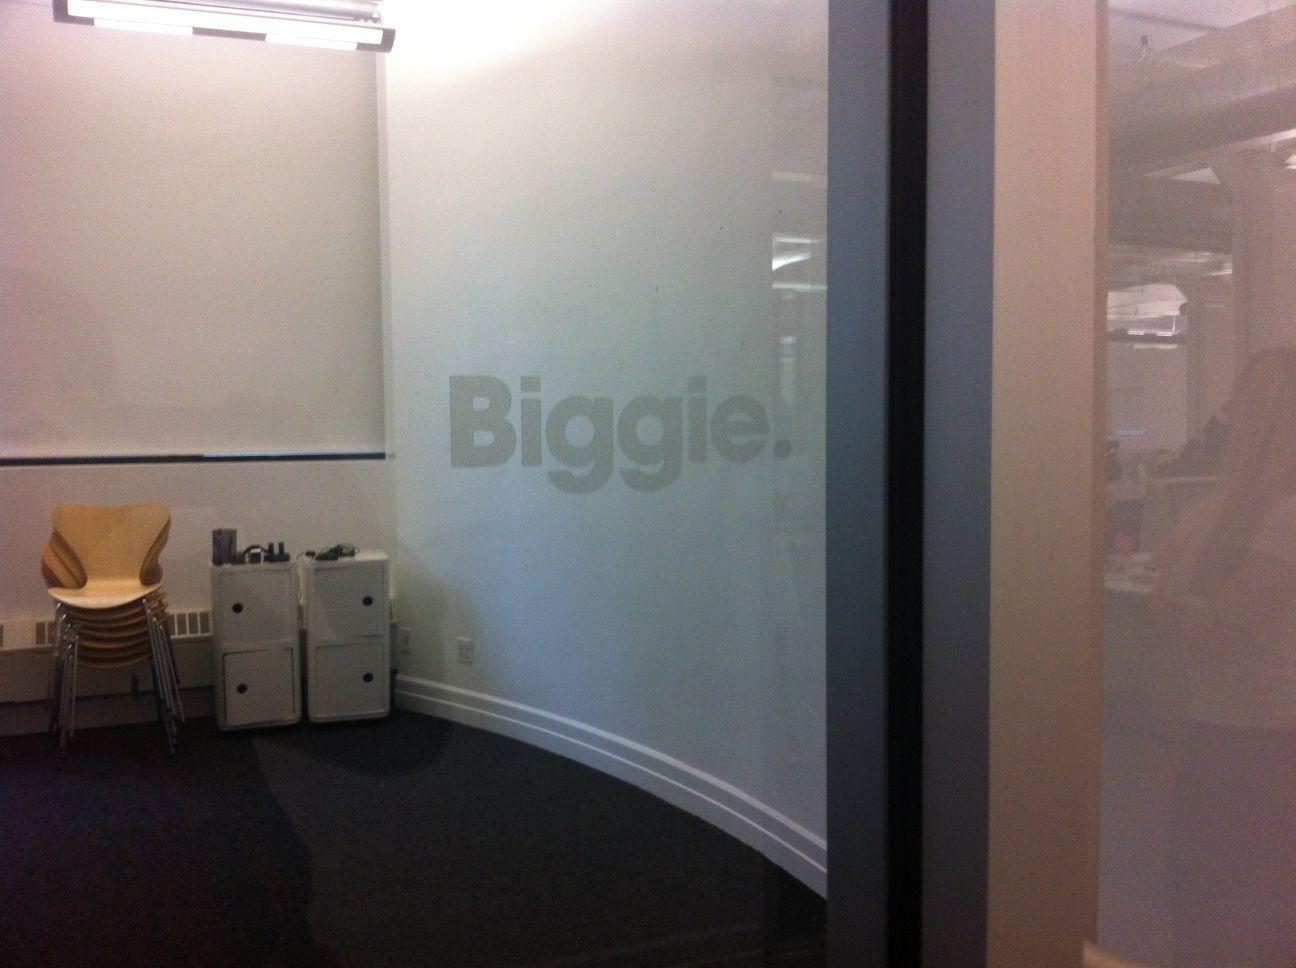 Sandblast Conference Room Names Meeting Room Names Meeting Room Design Meeting Room Design Office